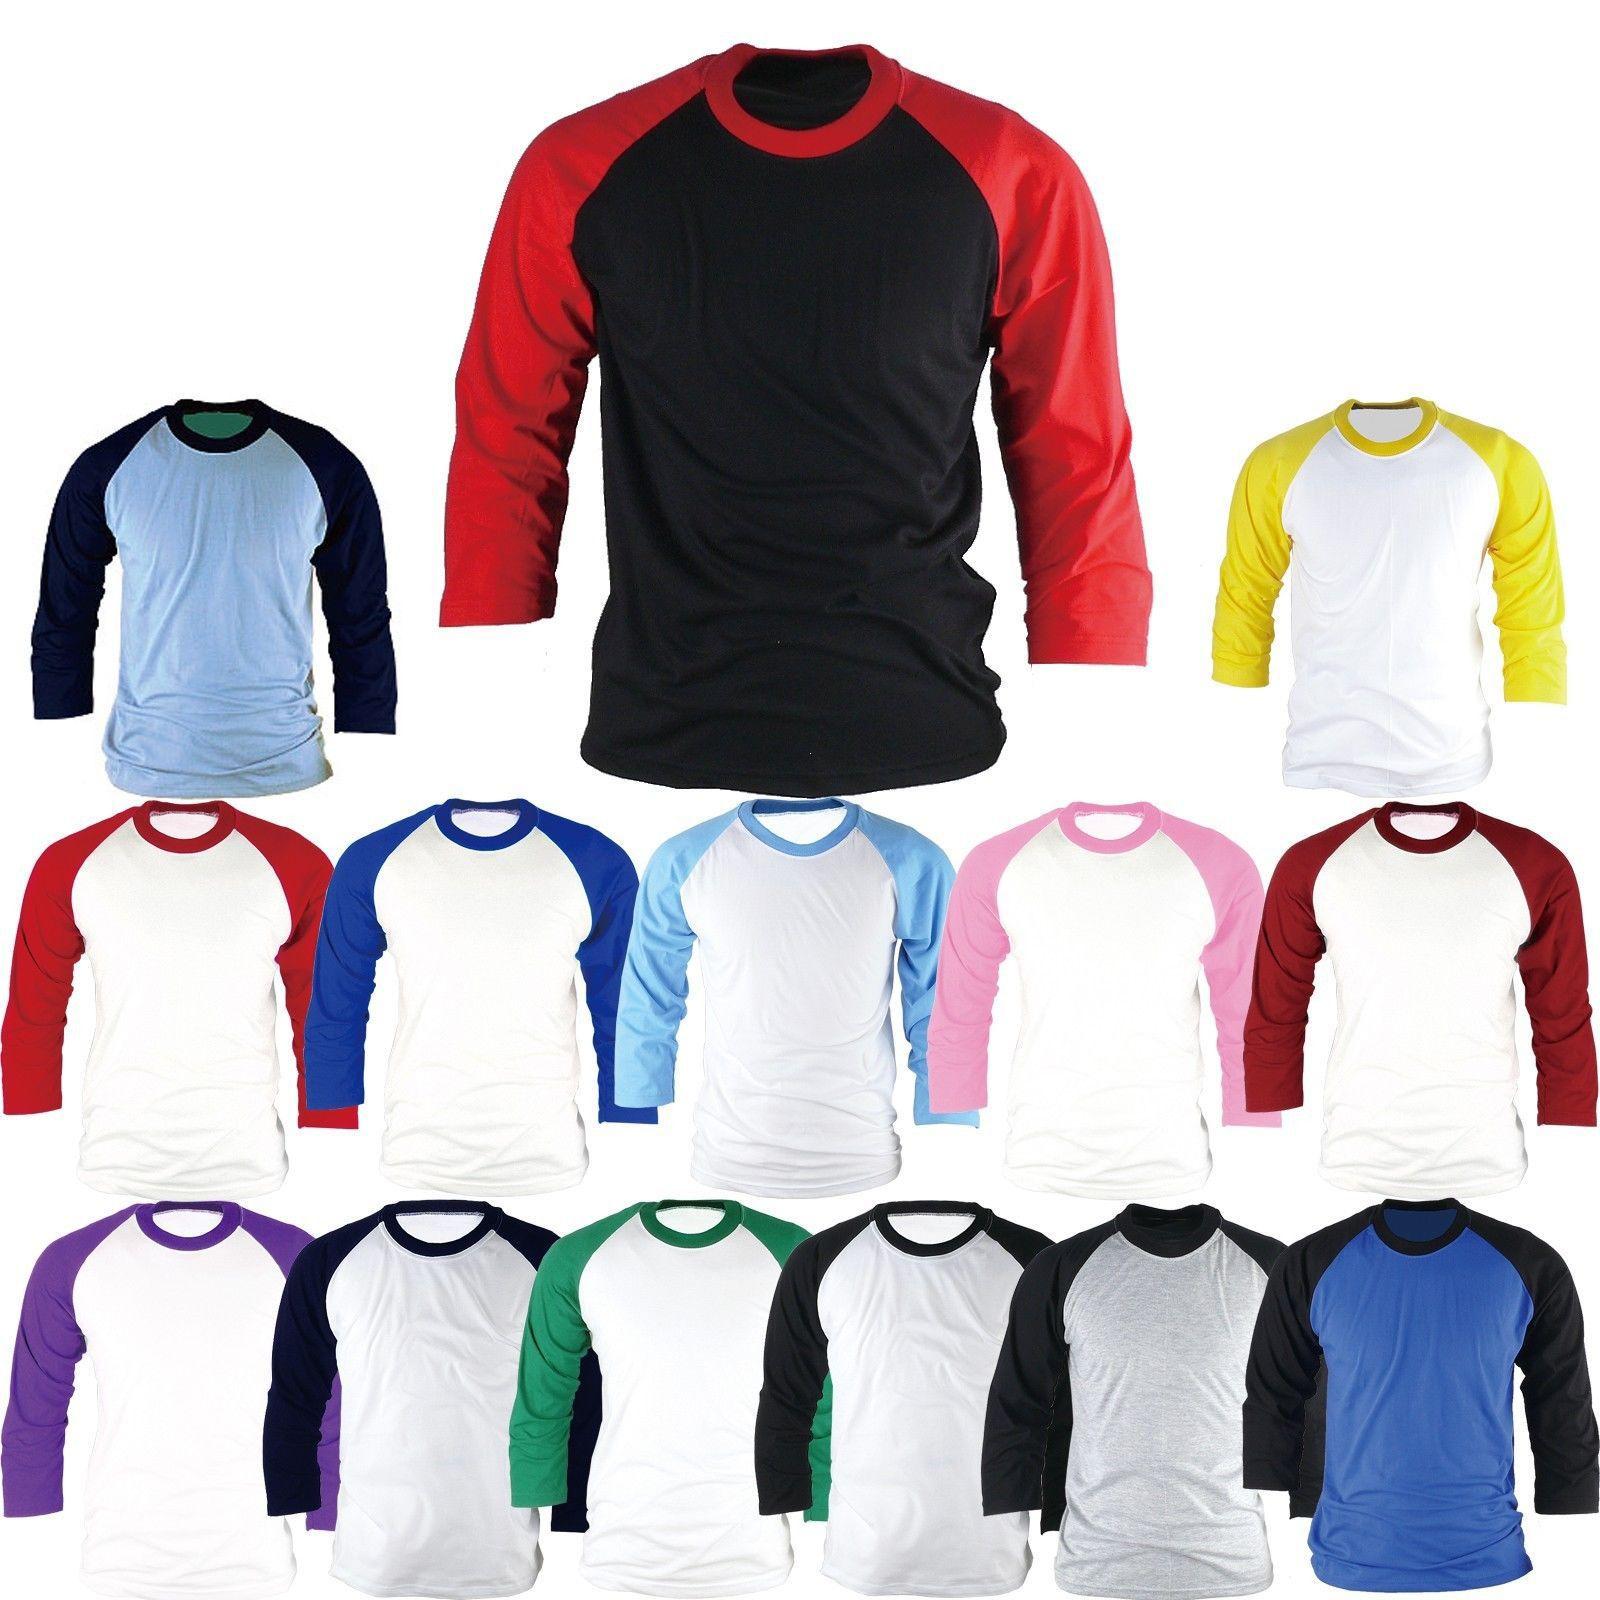 b1aee766686 Raglan T-Shirt 3 4 Sleeve Baseball Jersey Round Crew Neck Sports Team Tee